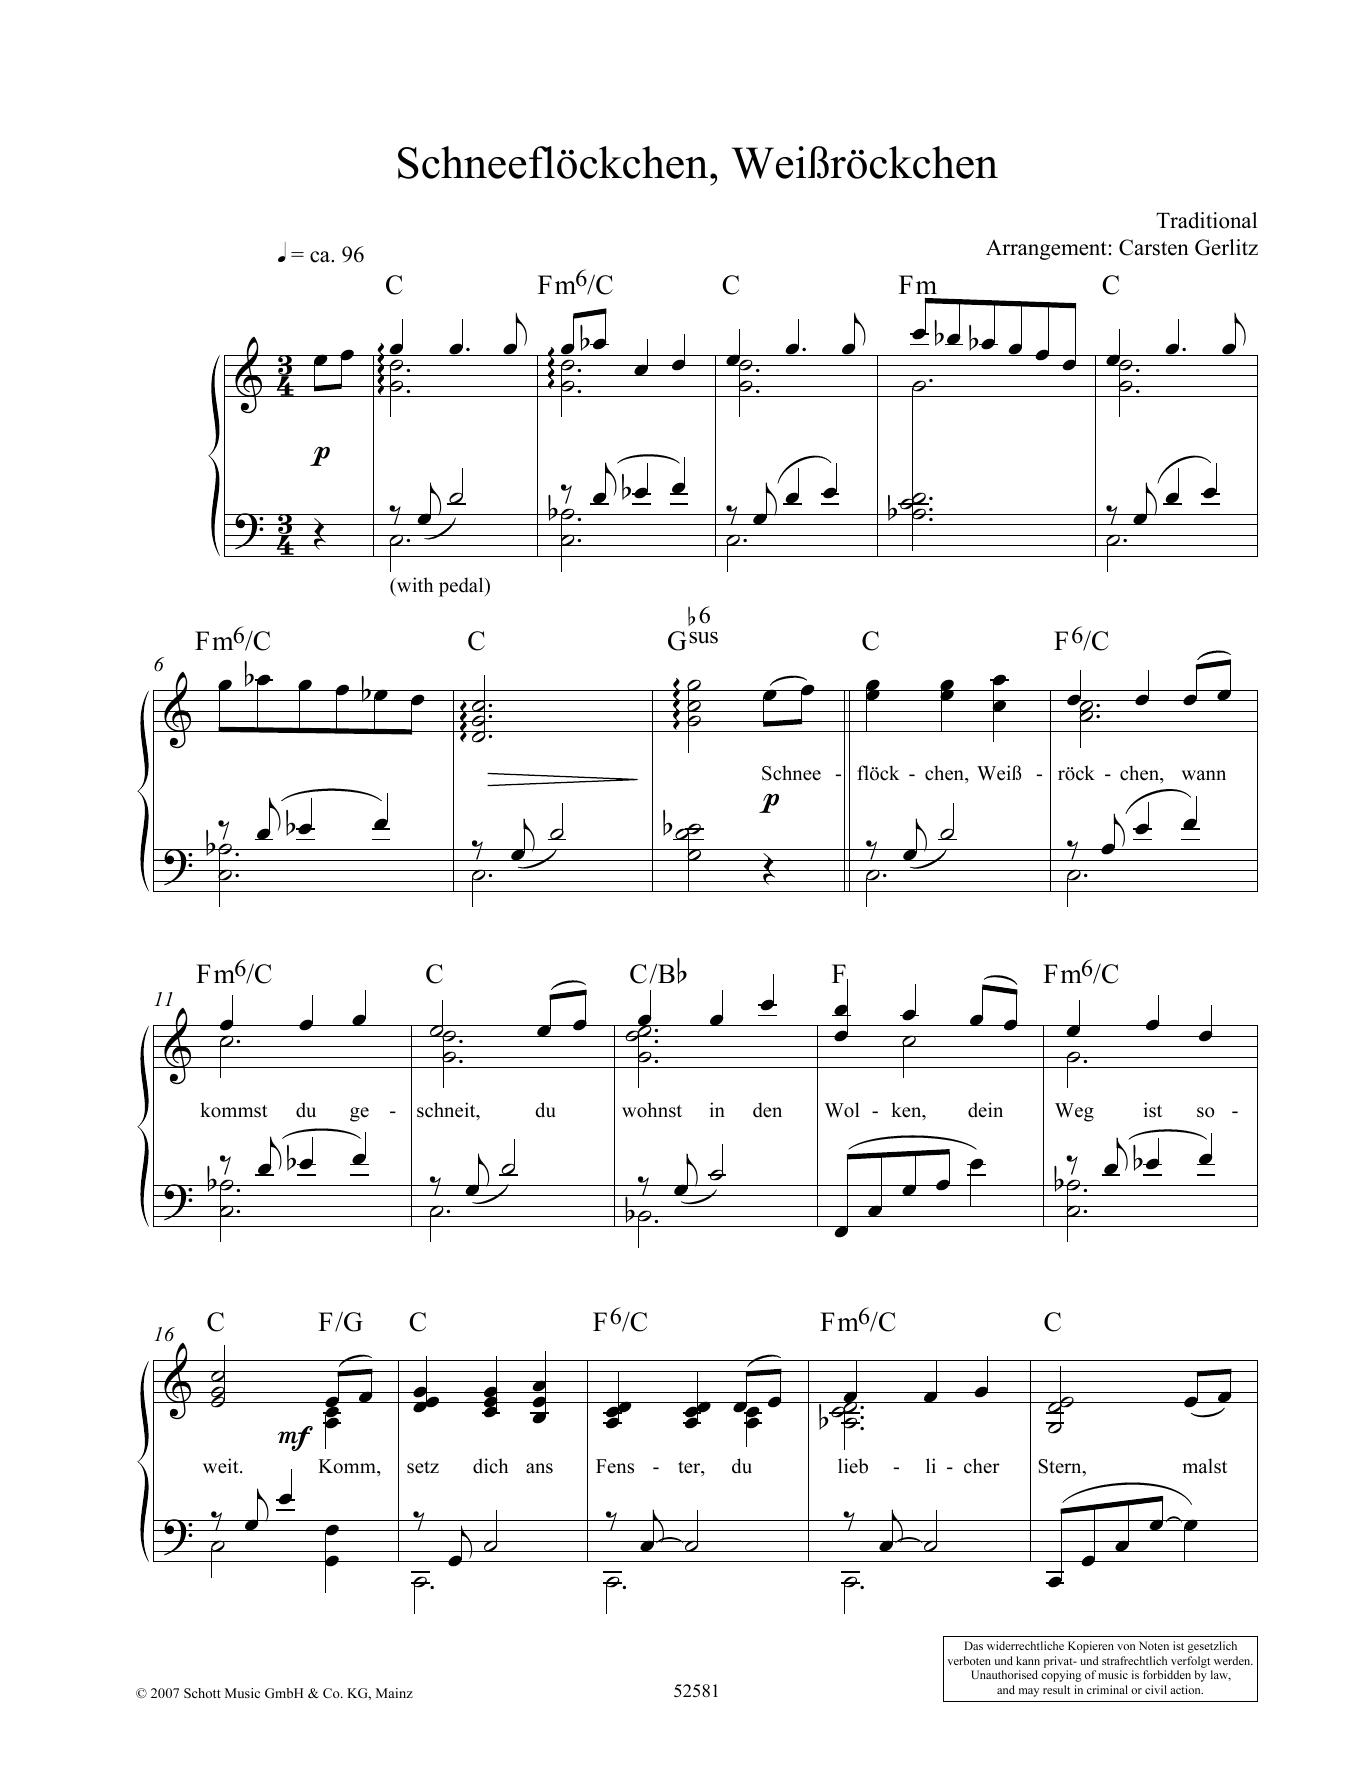 Schneeflöckchen, Weißröckchen Sheet Music